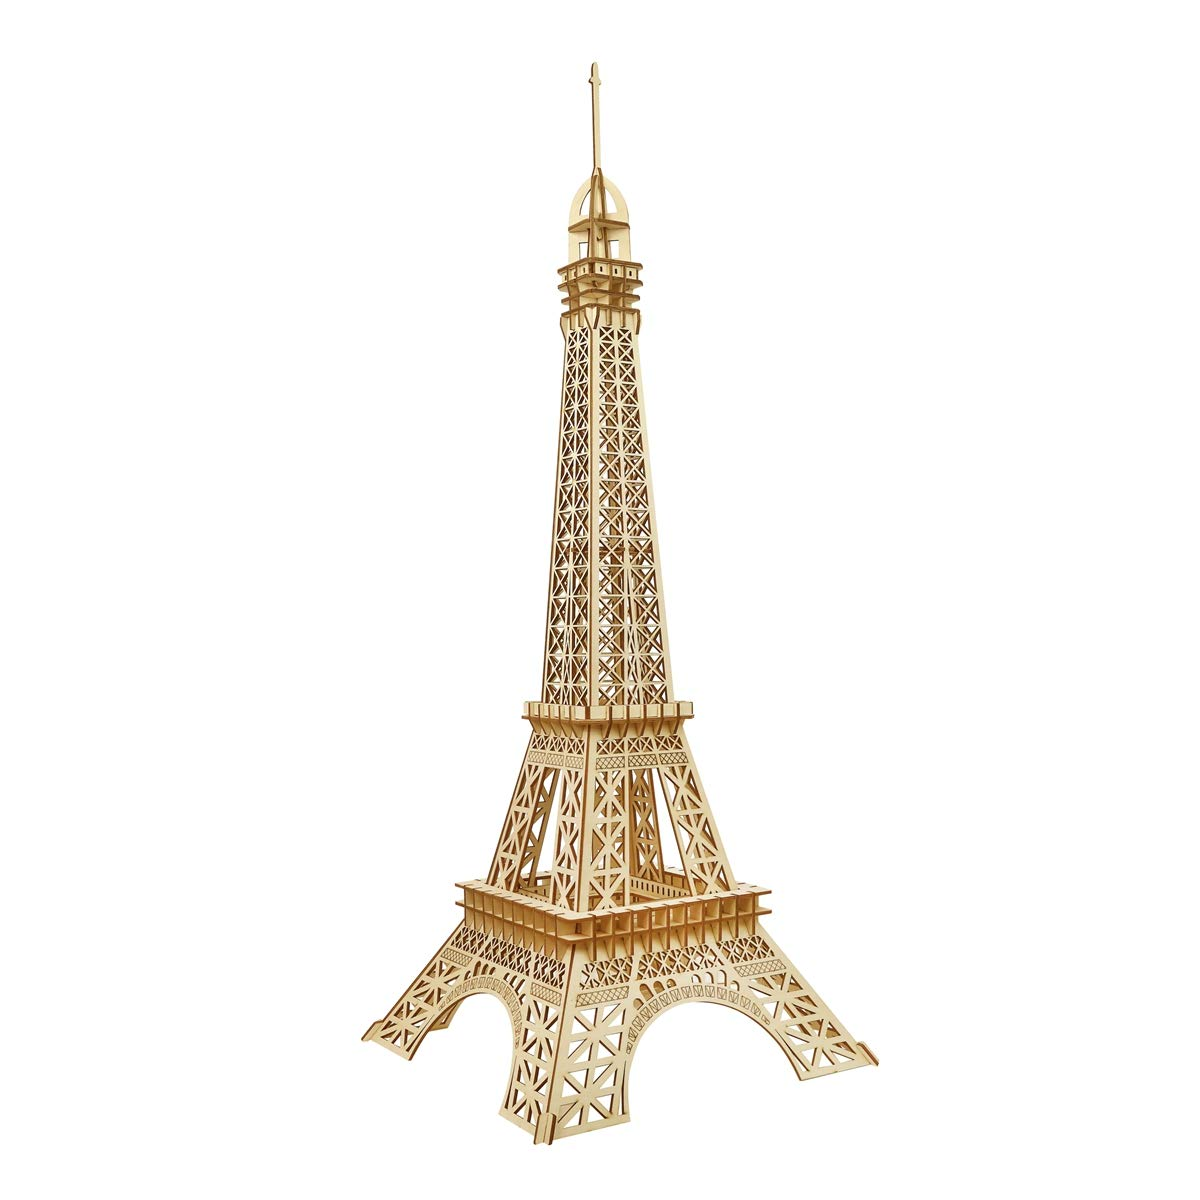 AHWZ 3D Puzzle DIY Wooden Jigsaw Puzzle Holzhandwerk Eiffelturm 105pc